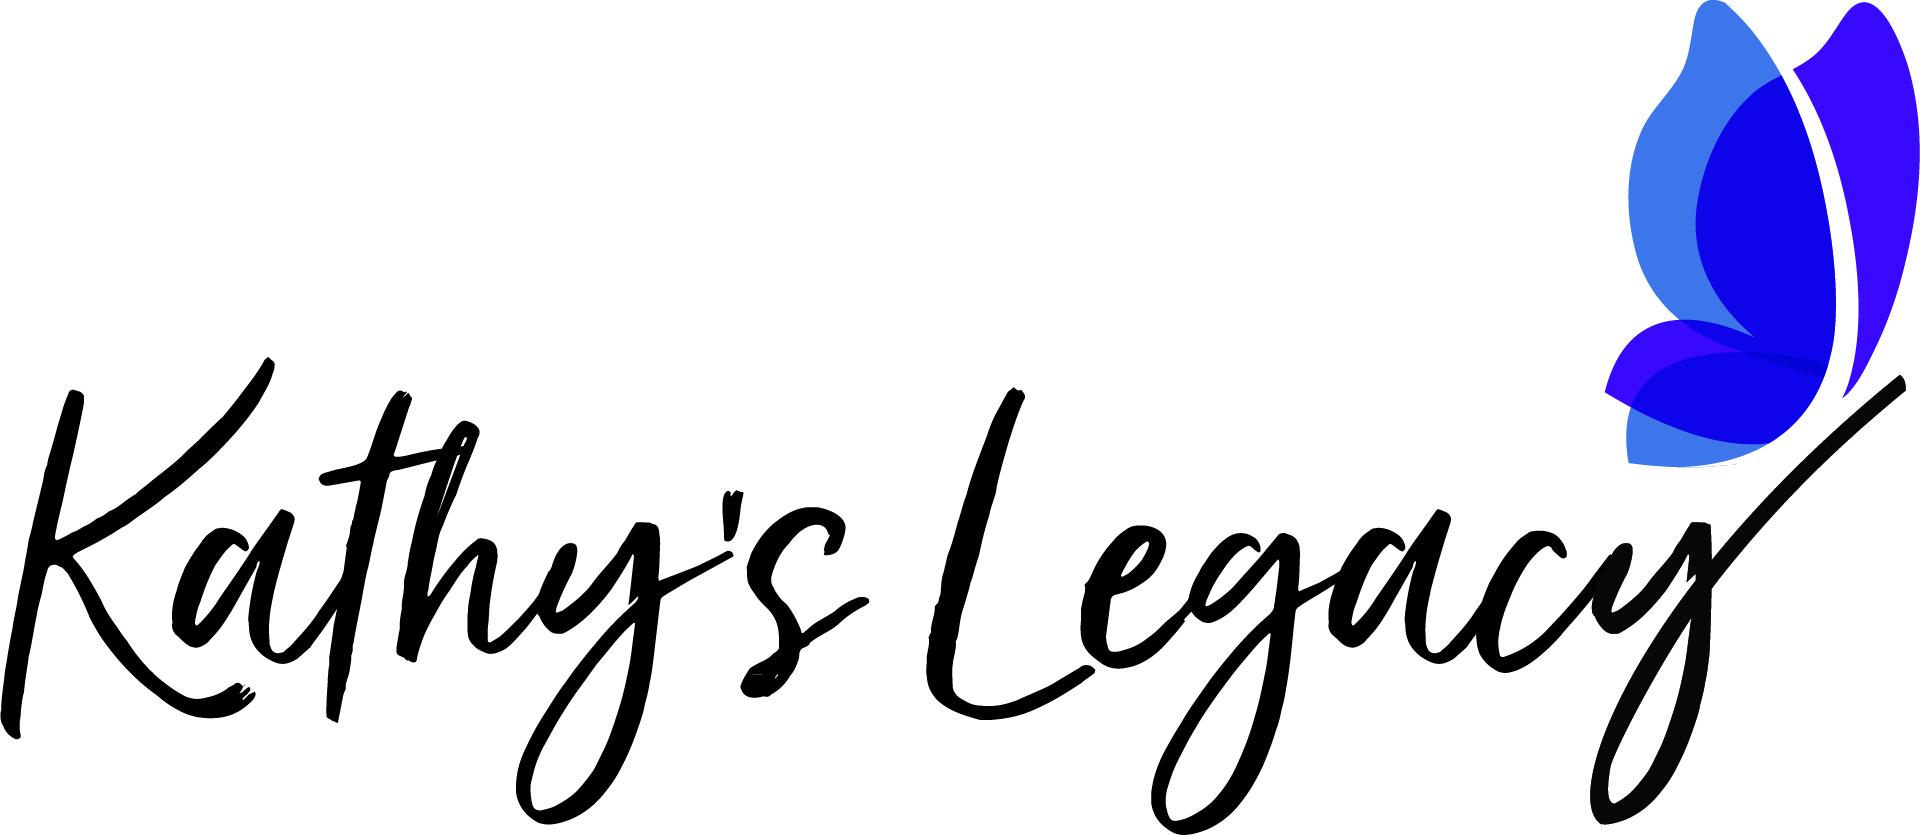 Kathy's Legacy Foundation 2021 Golf Tournament logo